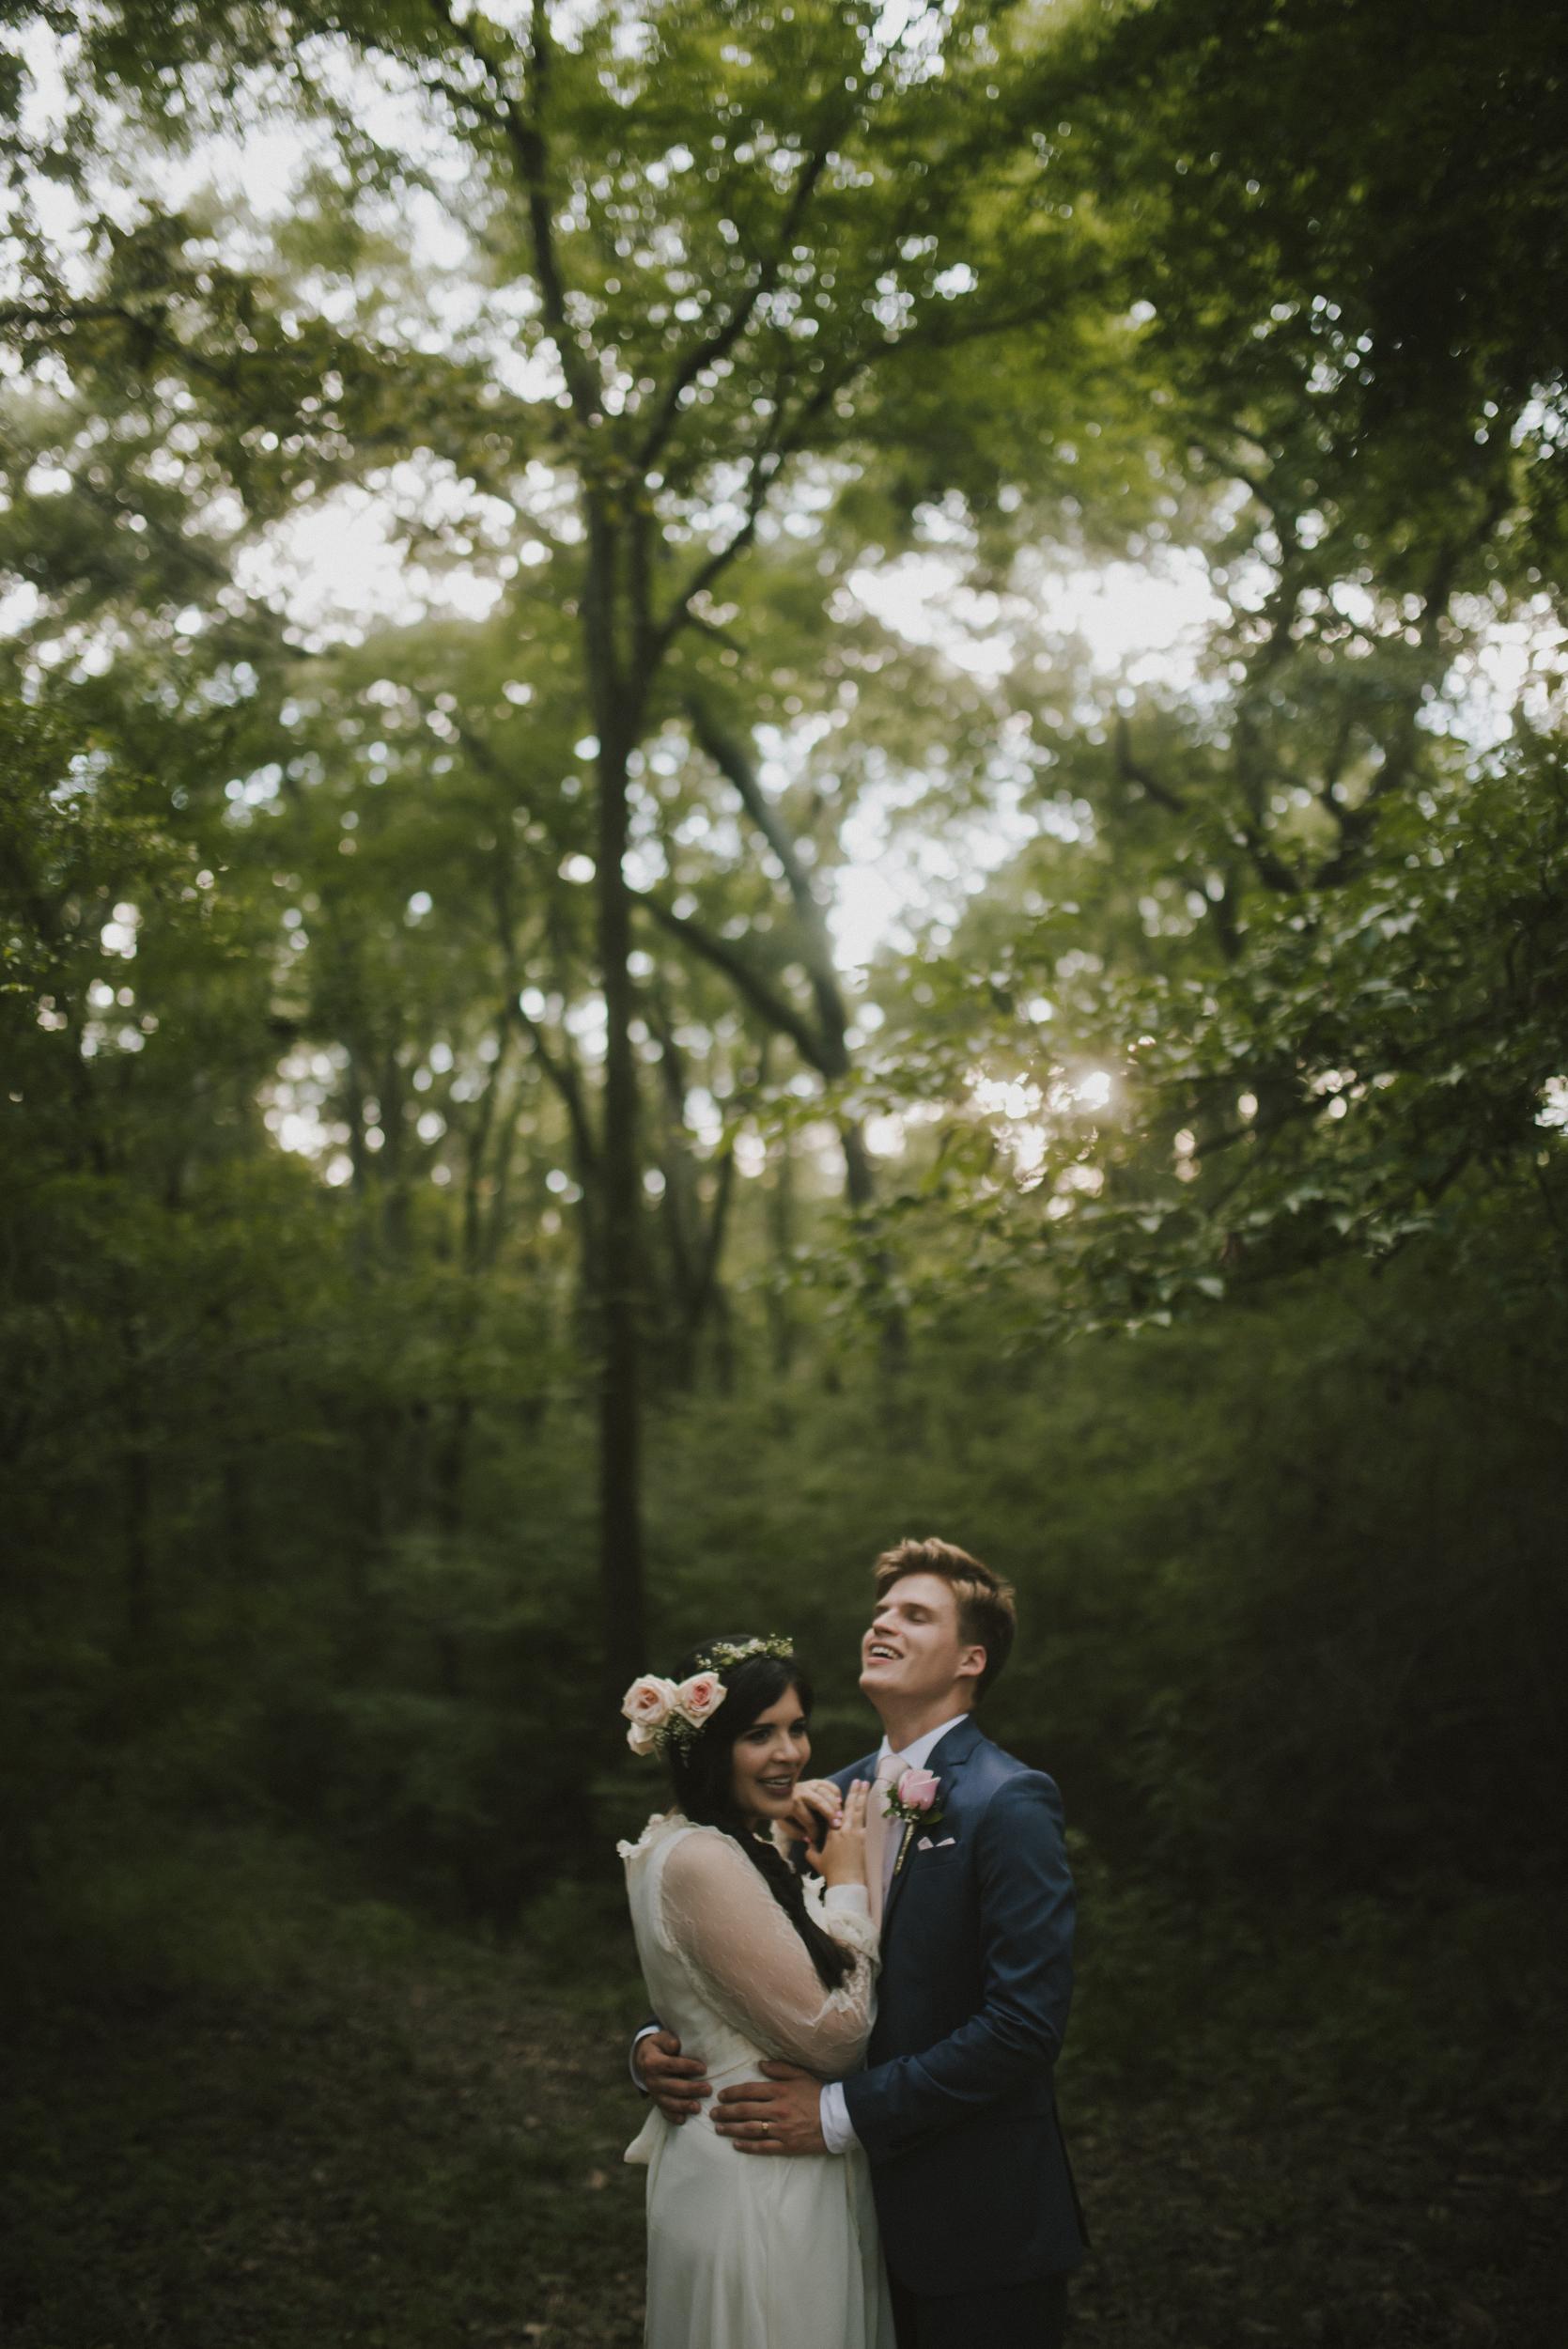 ofRen_weddingphotographer-150.jpg